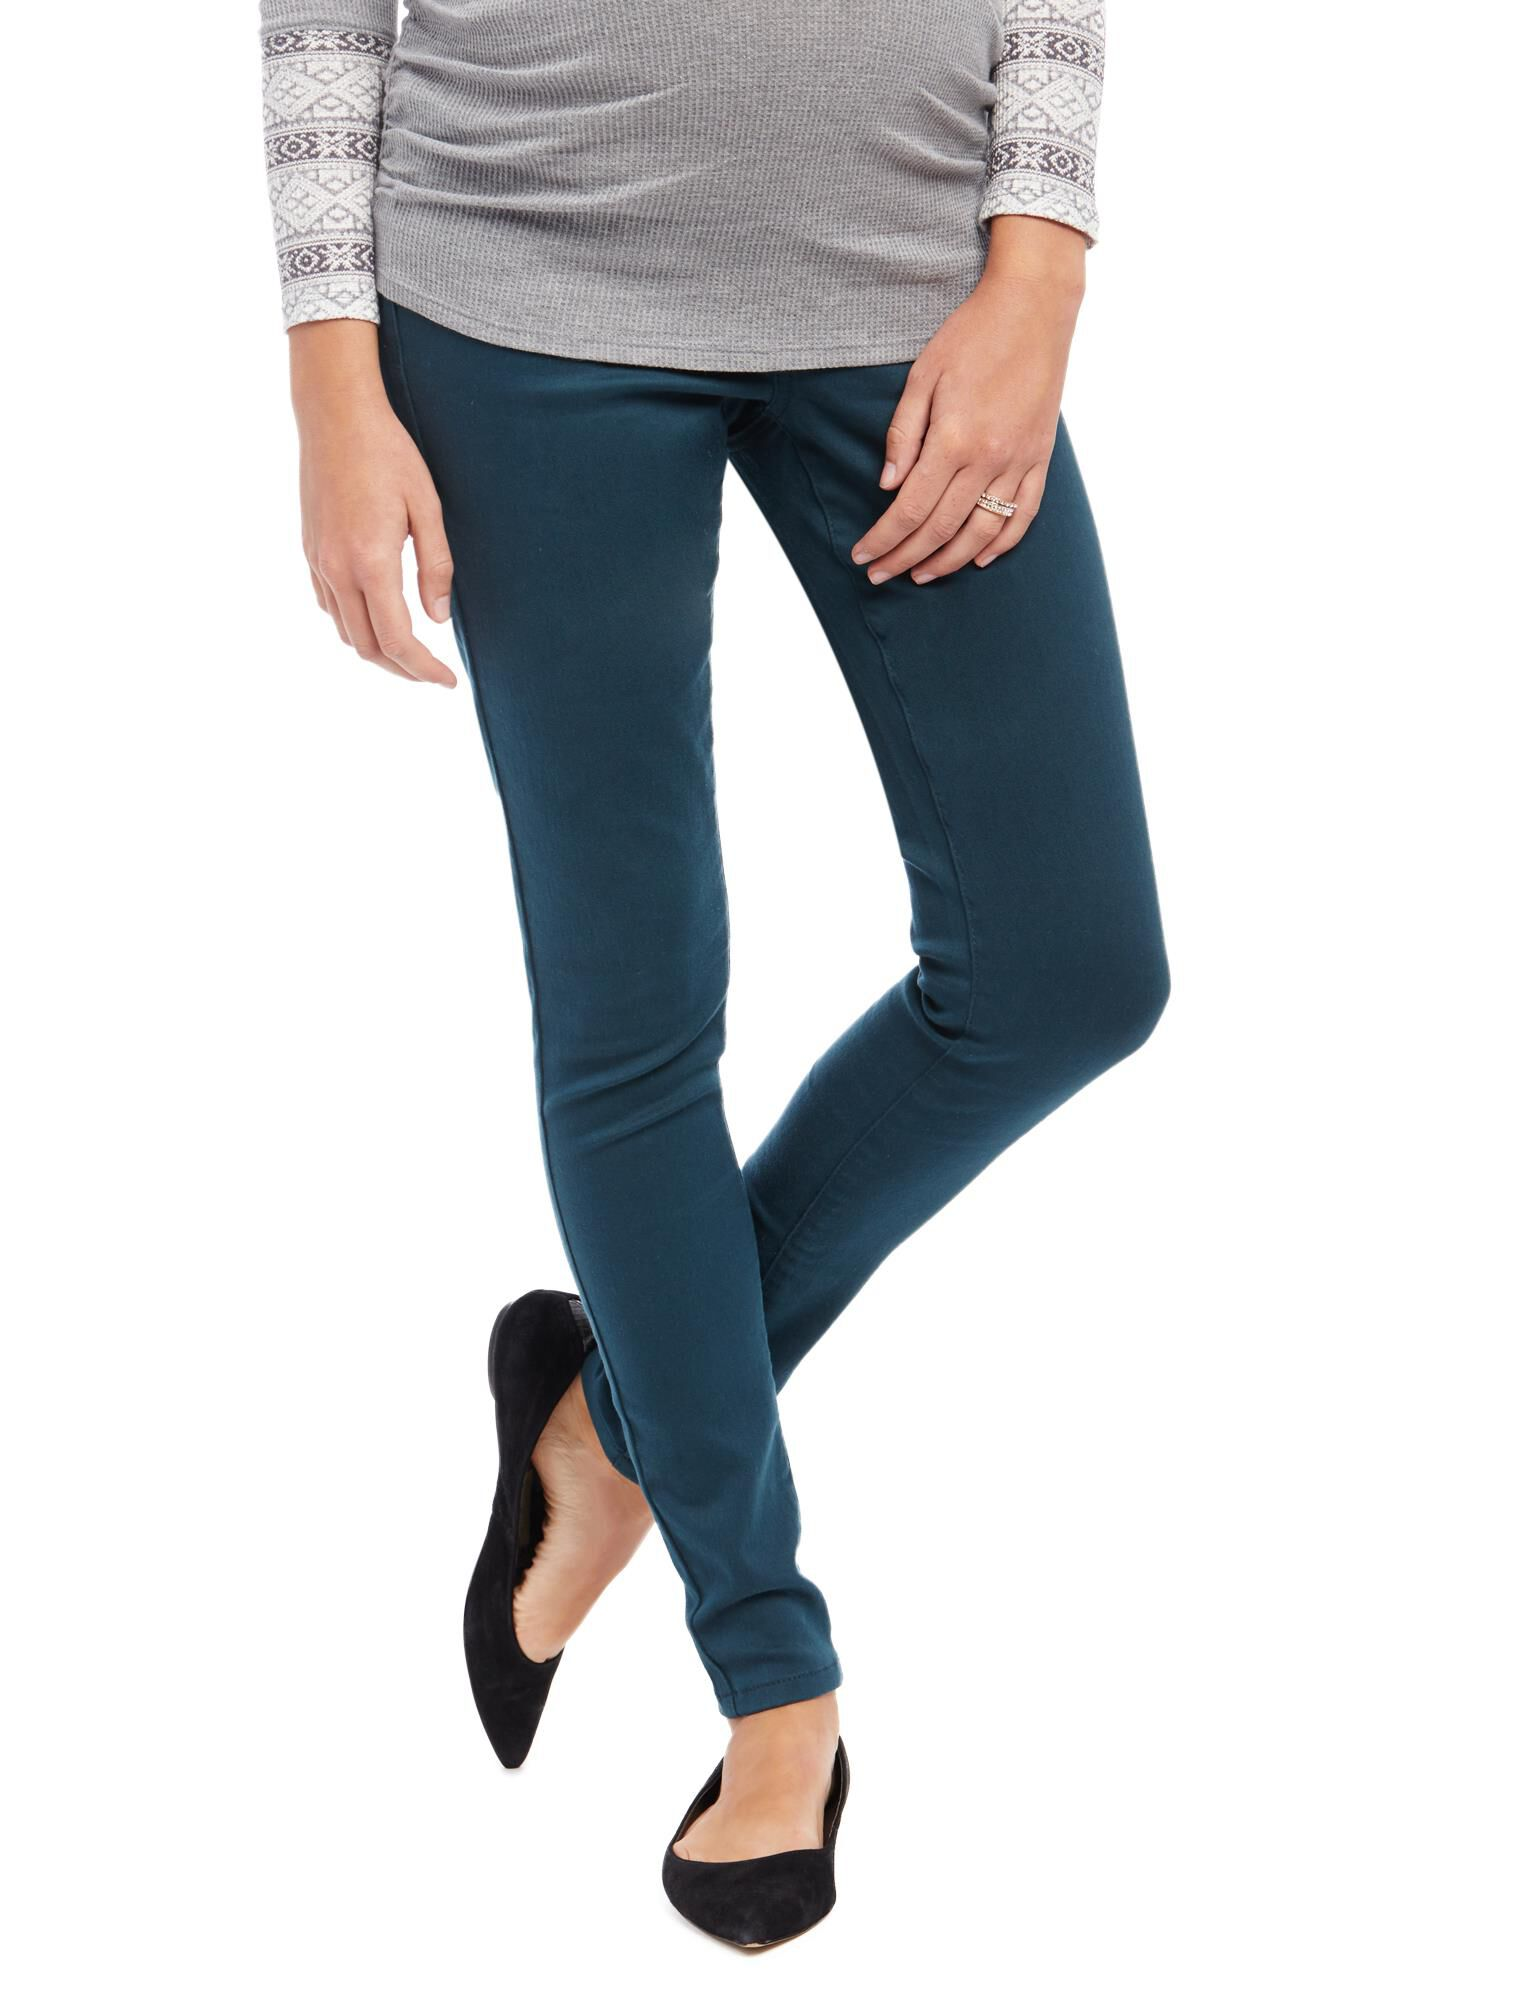 Secret Fit Belly Skinny Twill Maternity Pants- Evergreen